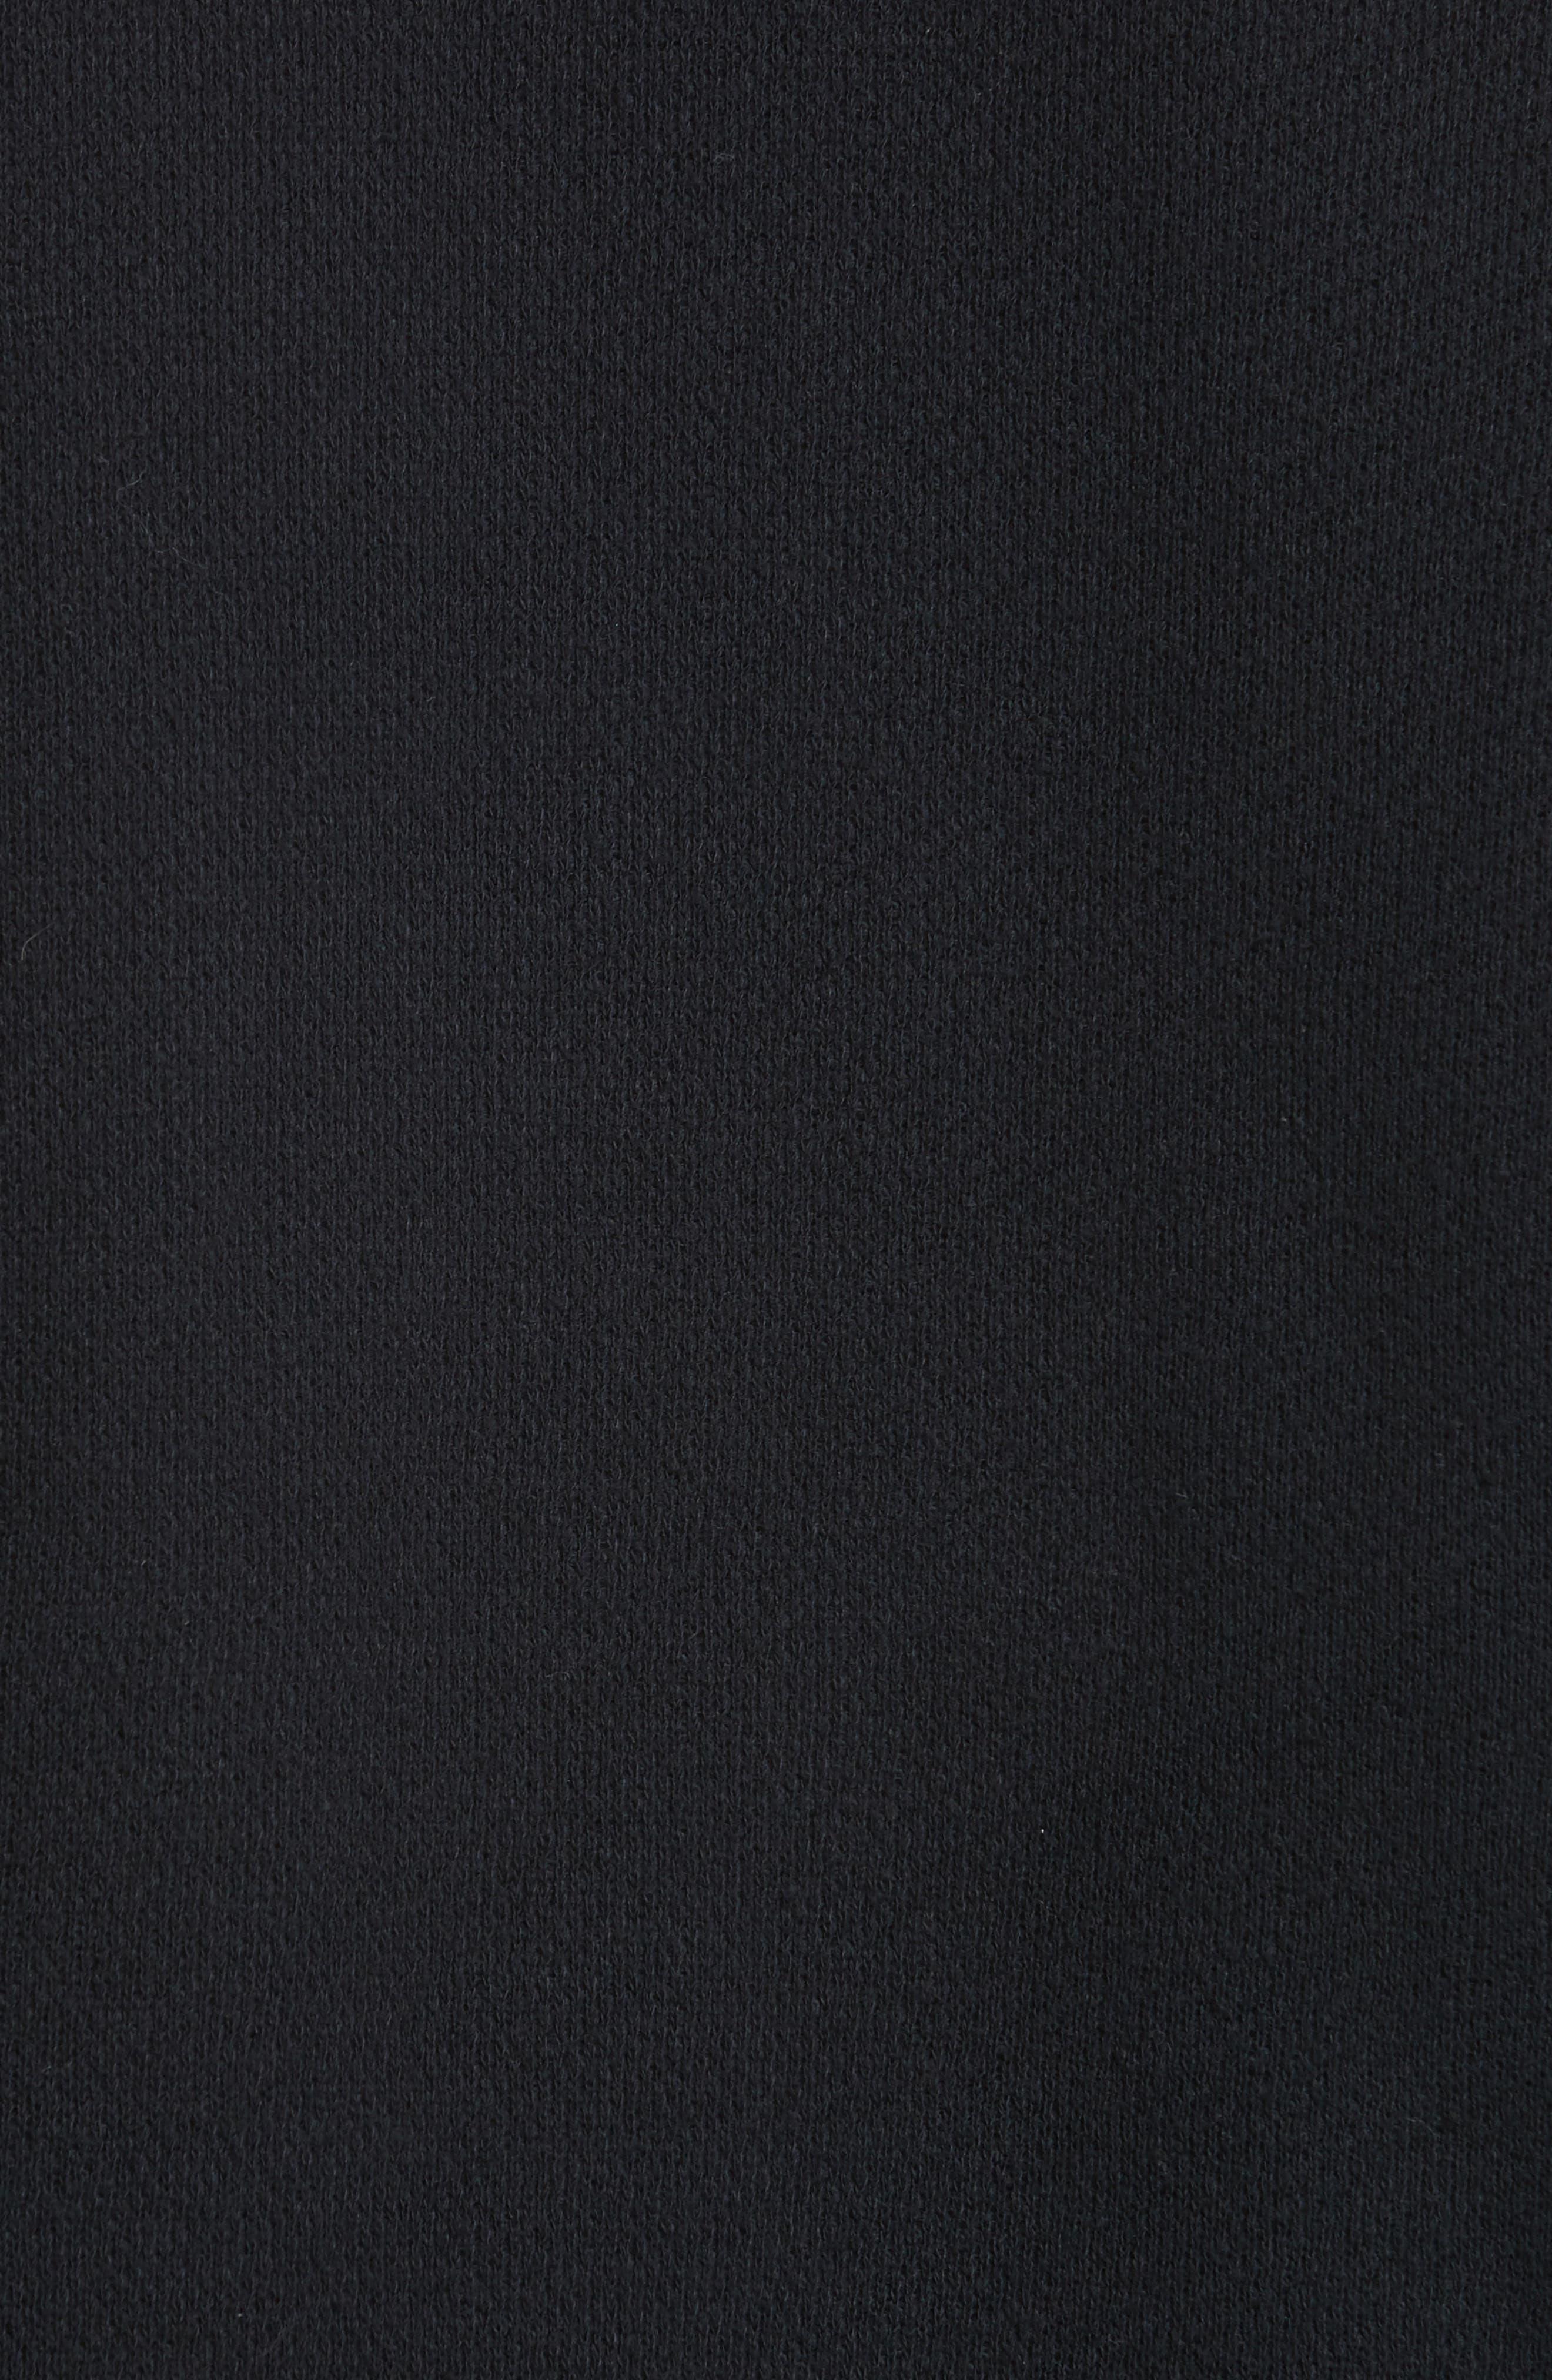 Tu es mon TRESOR Tulle Flower Sweatshirt,                             Alternate thumbnail 5, color,                             Black/ Mint Bkmi